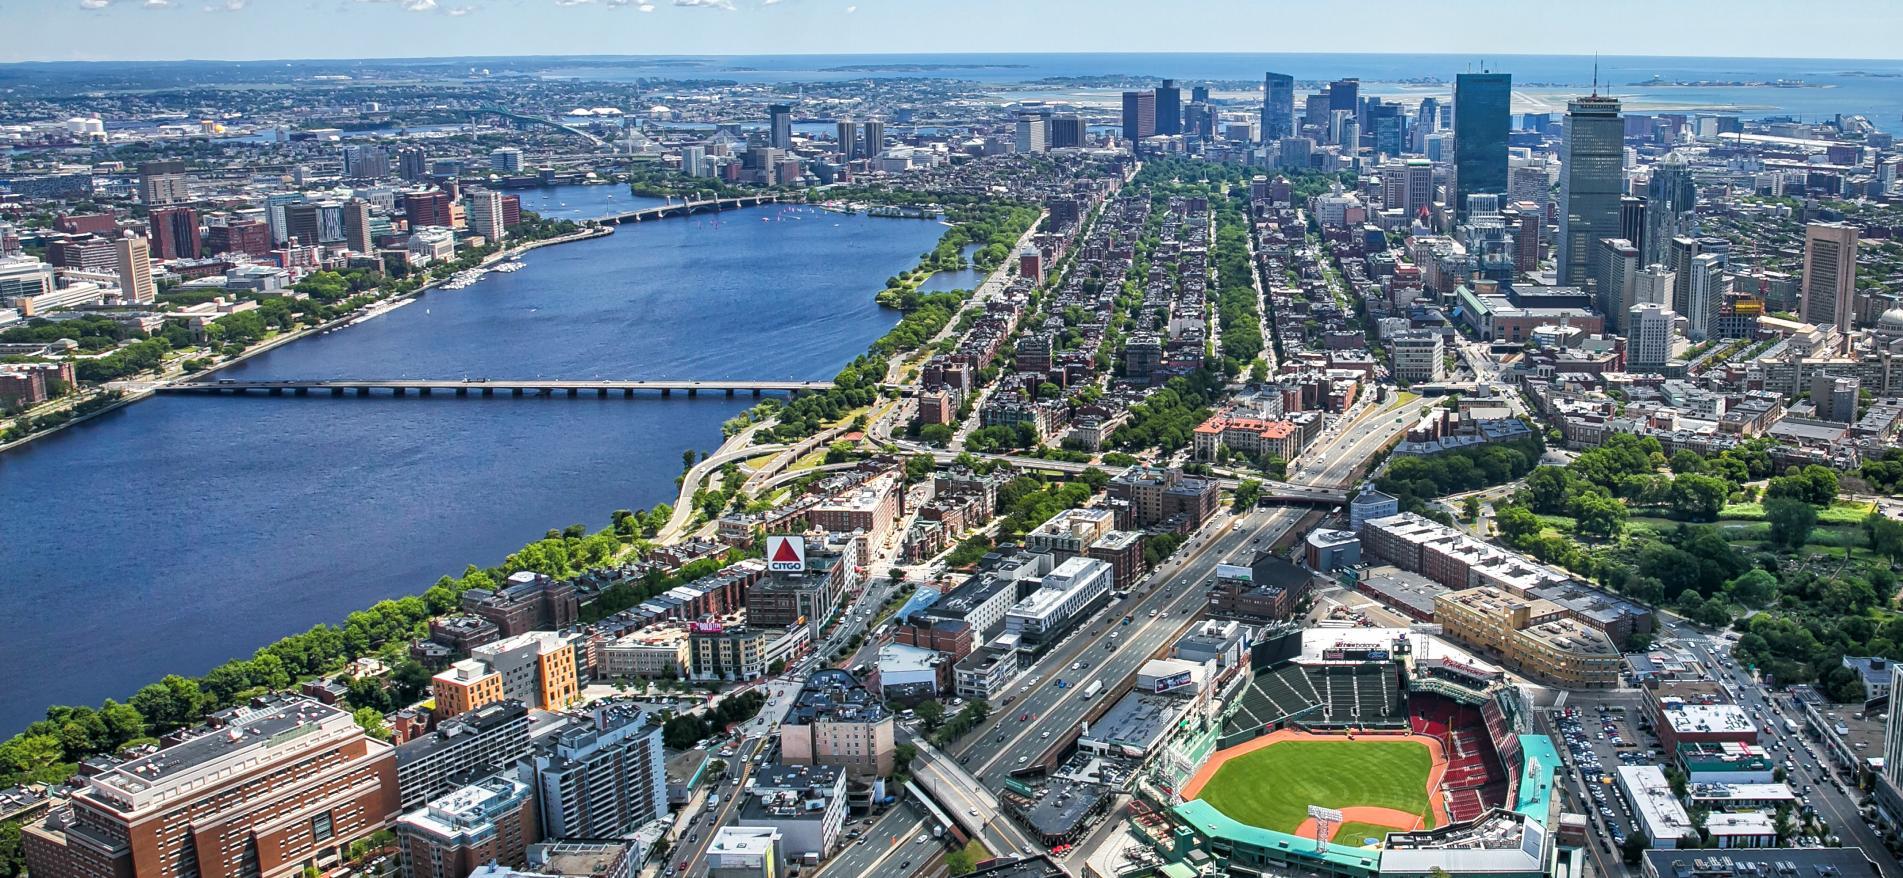 Výsledek obrázku pro boston